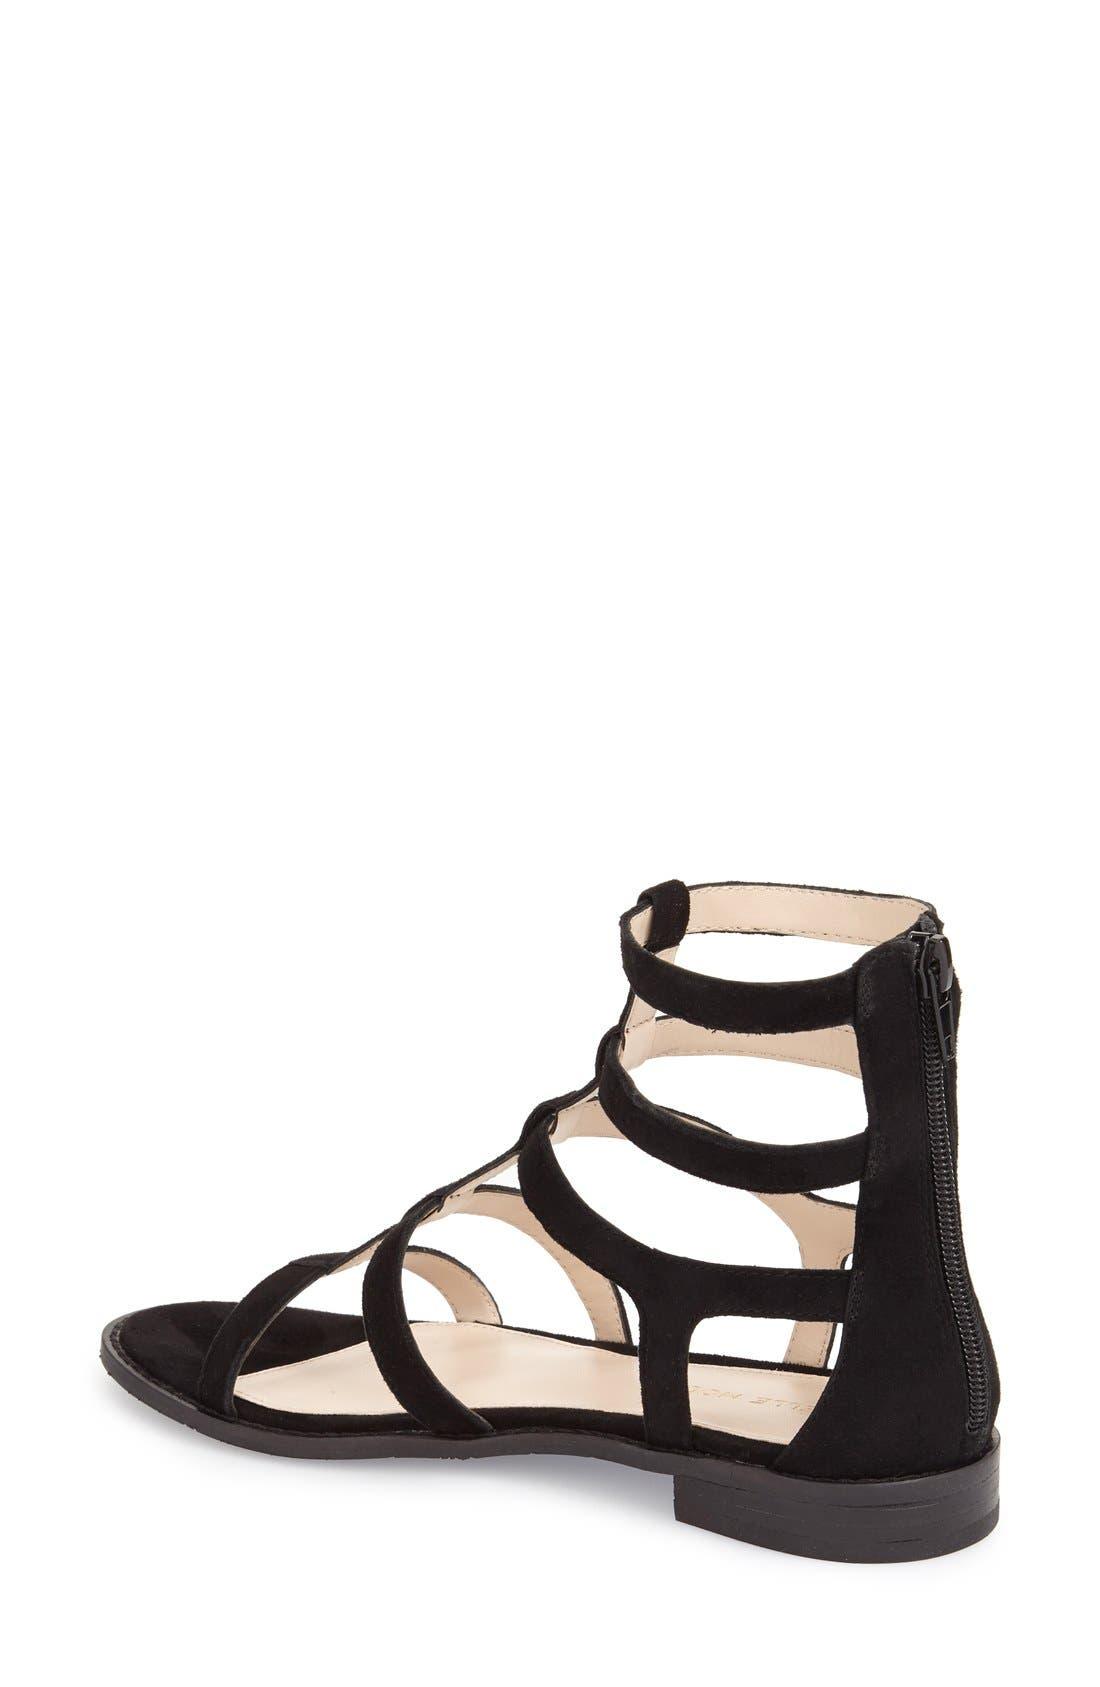 'Helen' Flat Gladiator Sandal,                             Alternate thumbnail 2, color,                             Black Leather